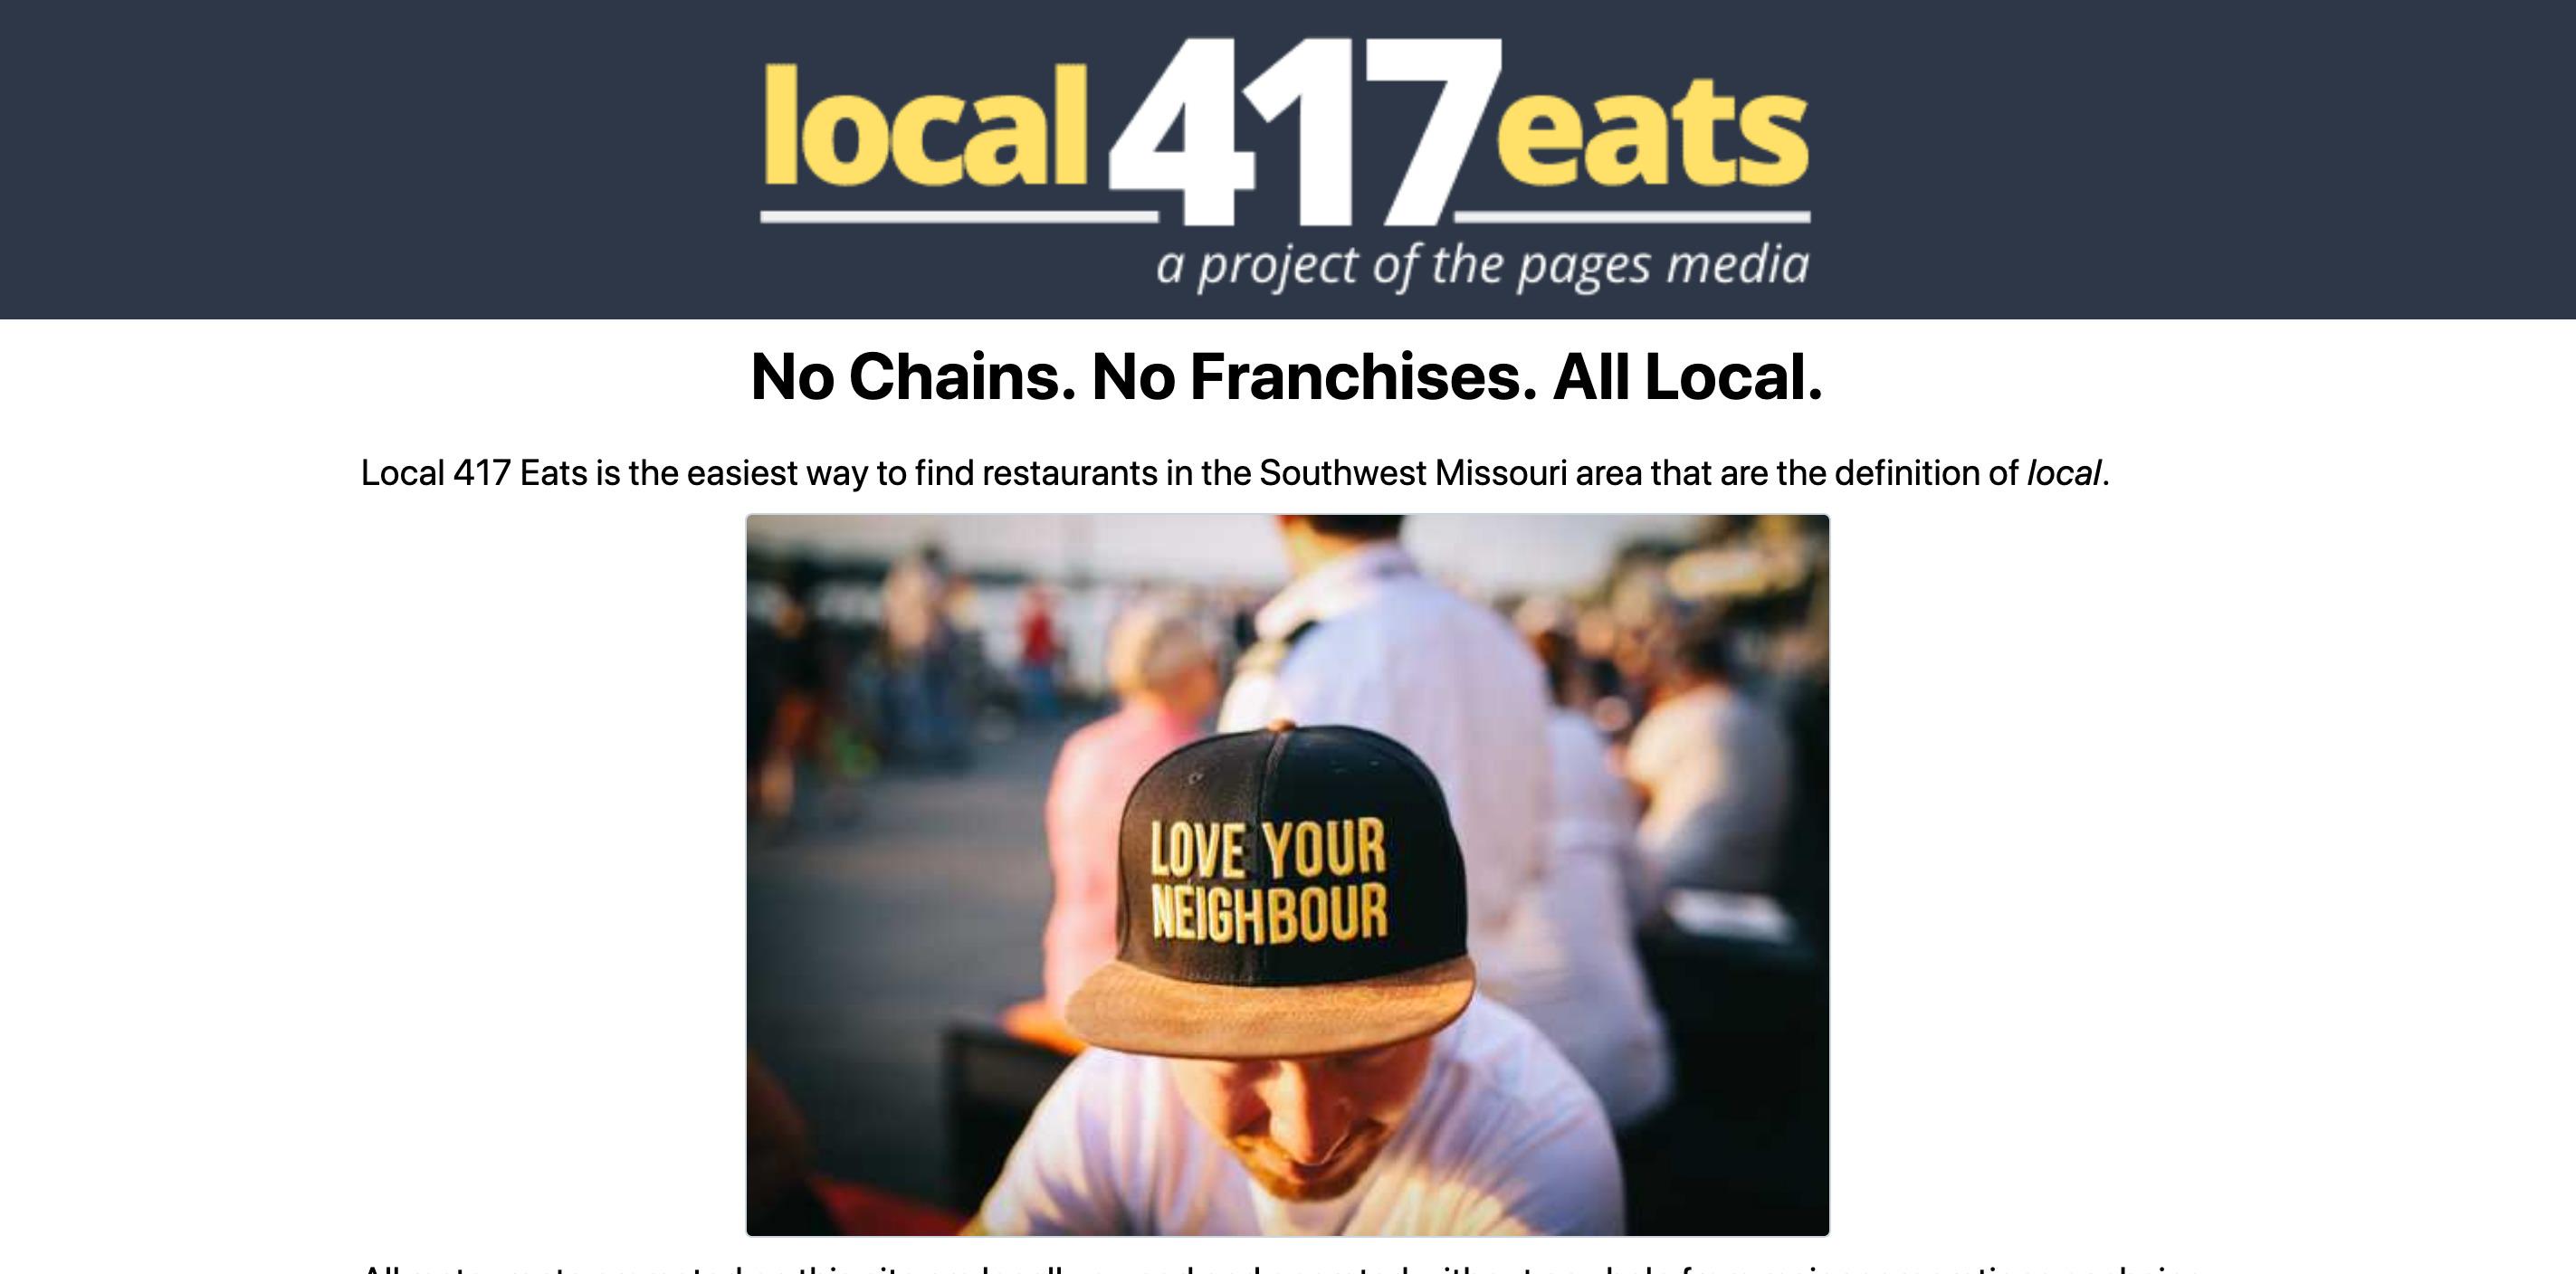 screenshot of local 417 eats website